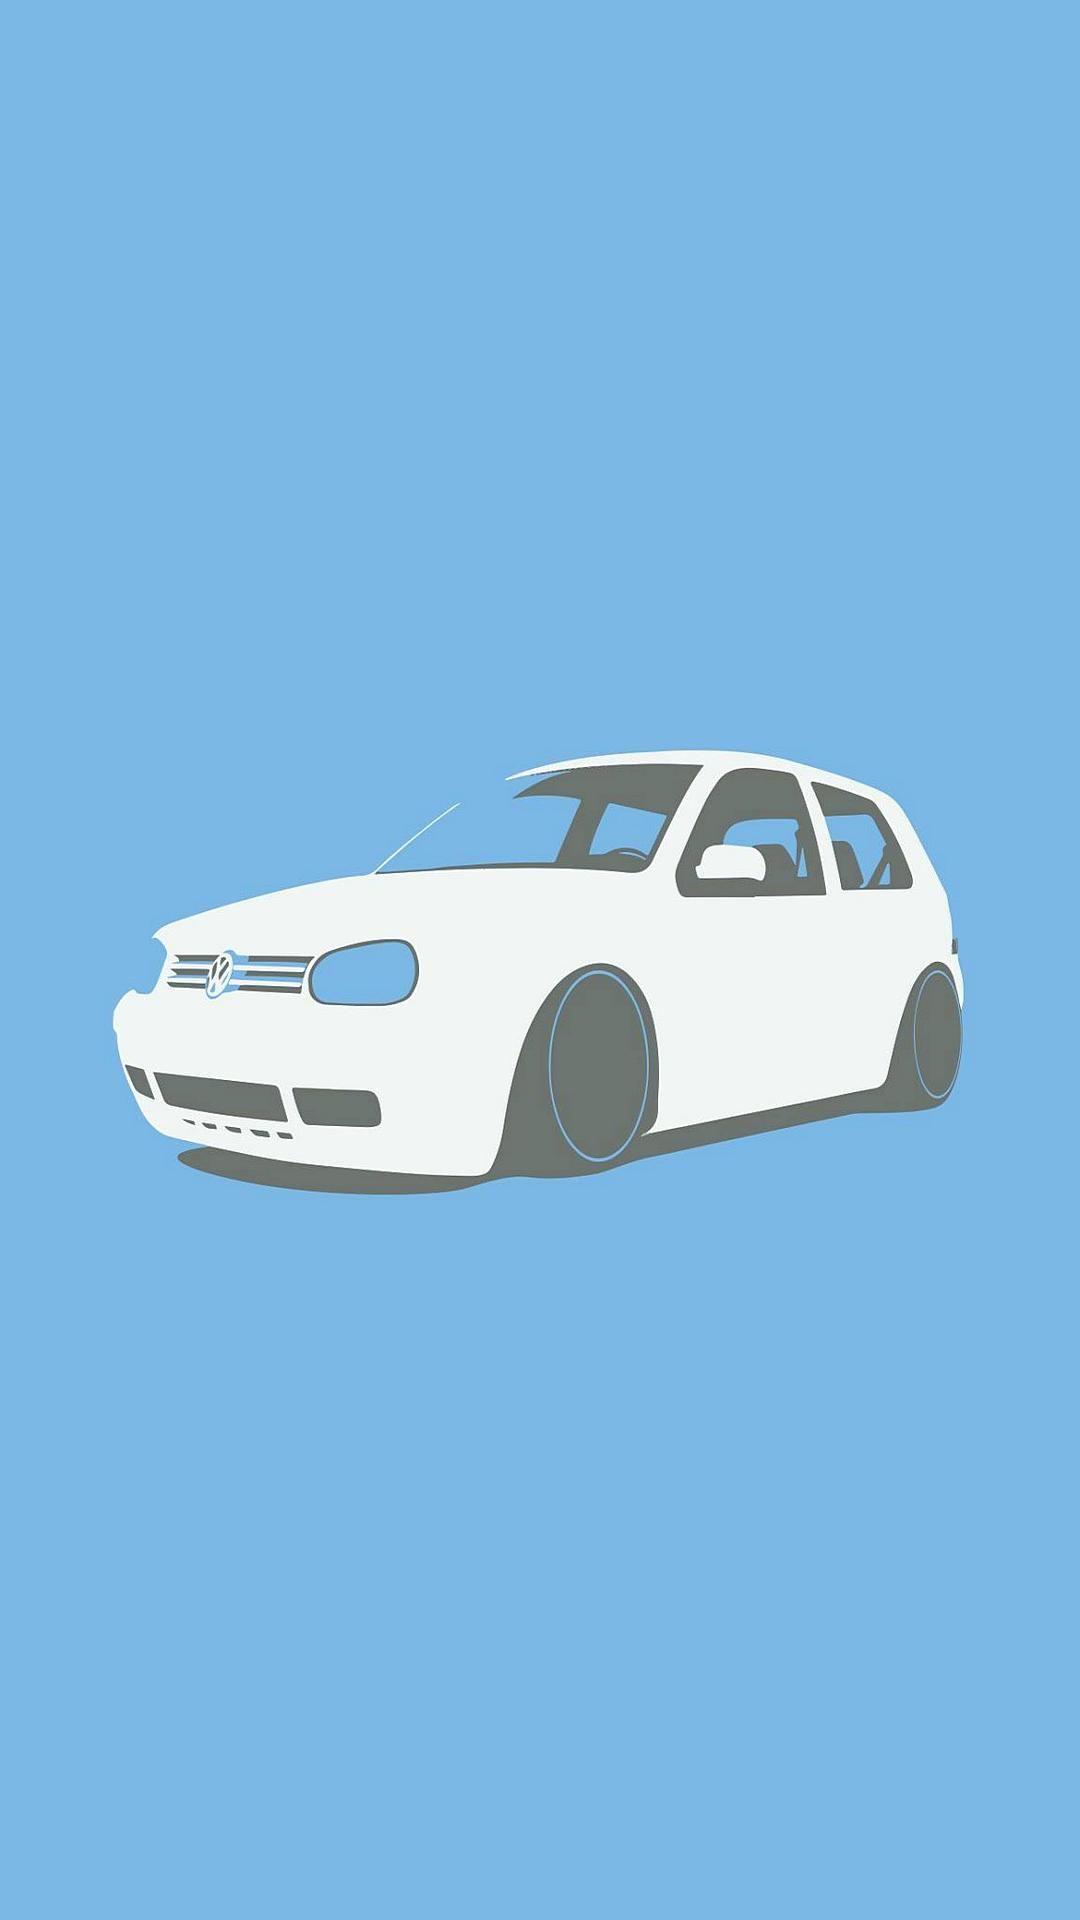 Mobile Full Hd Minimal Wallpaper 1080x1920 Minimal Wallpaper Cute Mobile Wallpapers White Car